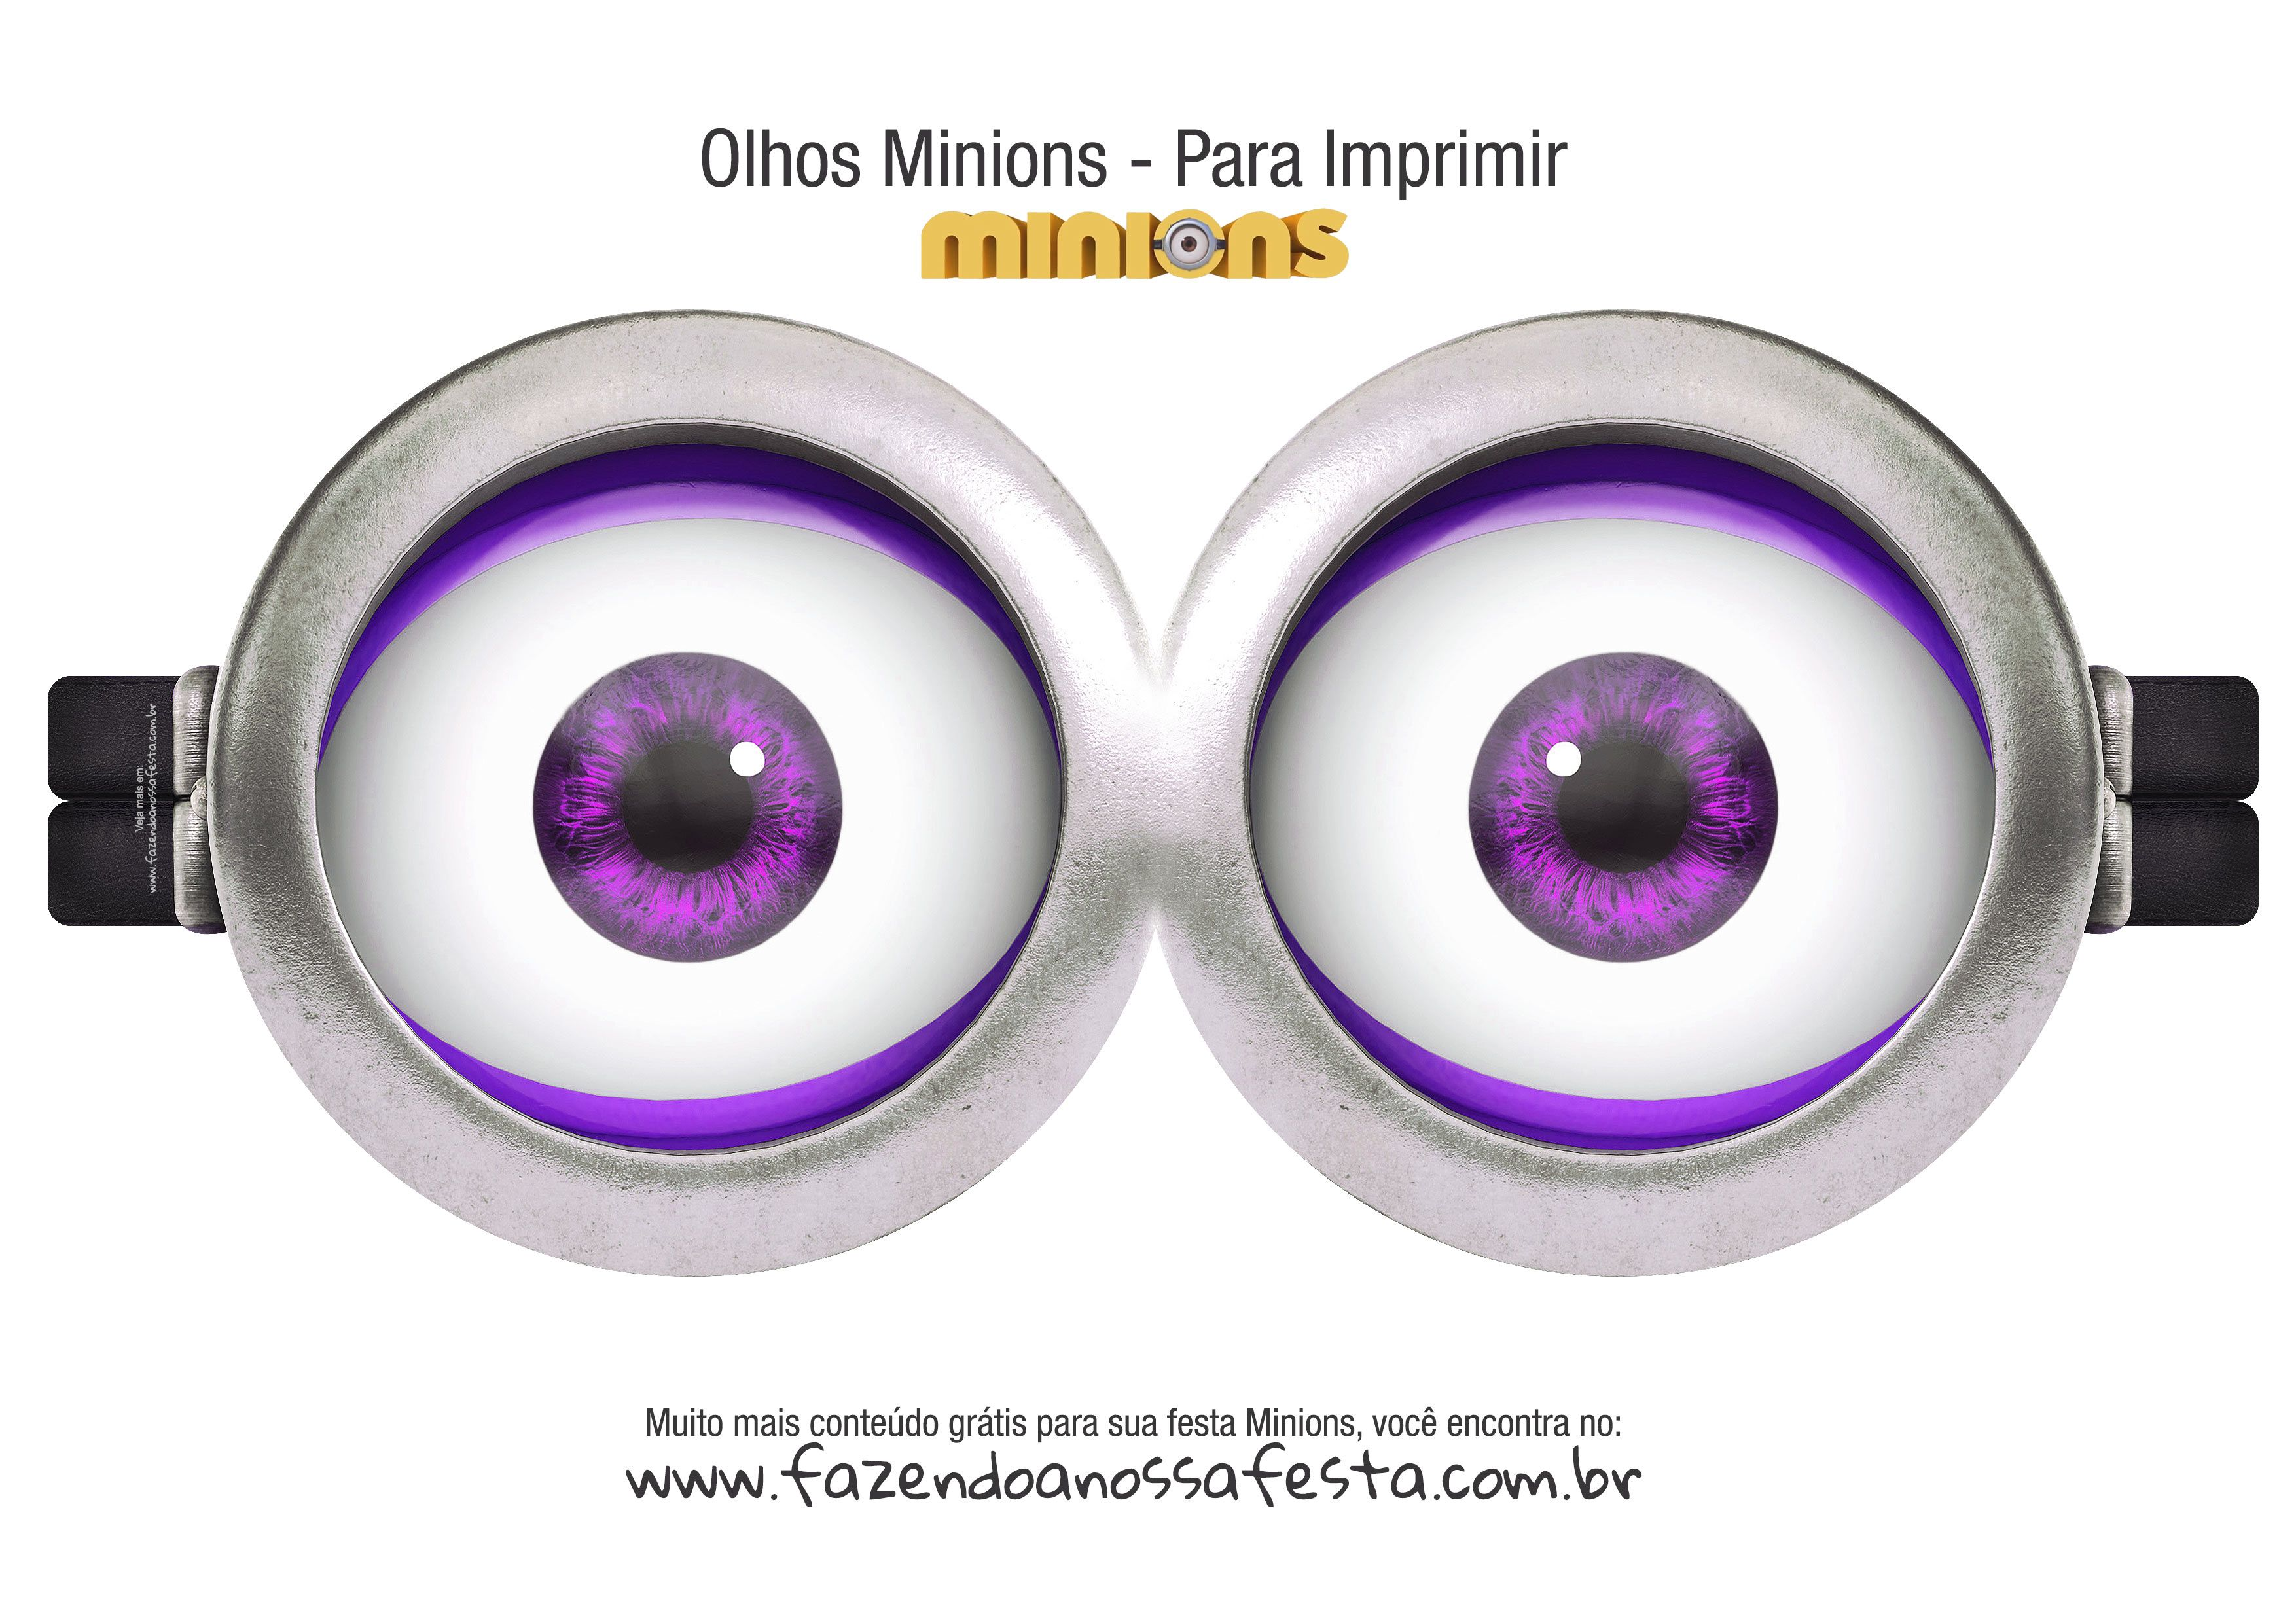 Olhos Minions Evil 2 Eyes Minions Festa Minion E Olhos